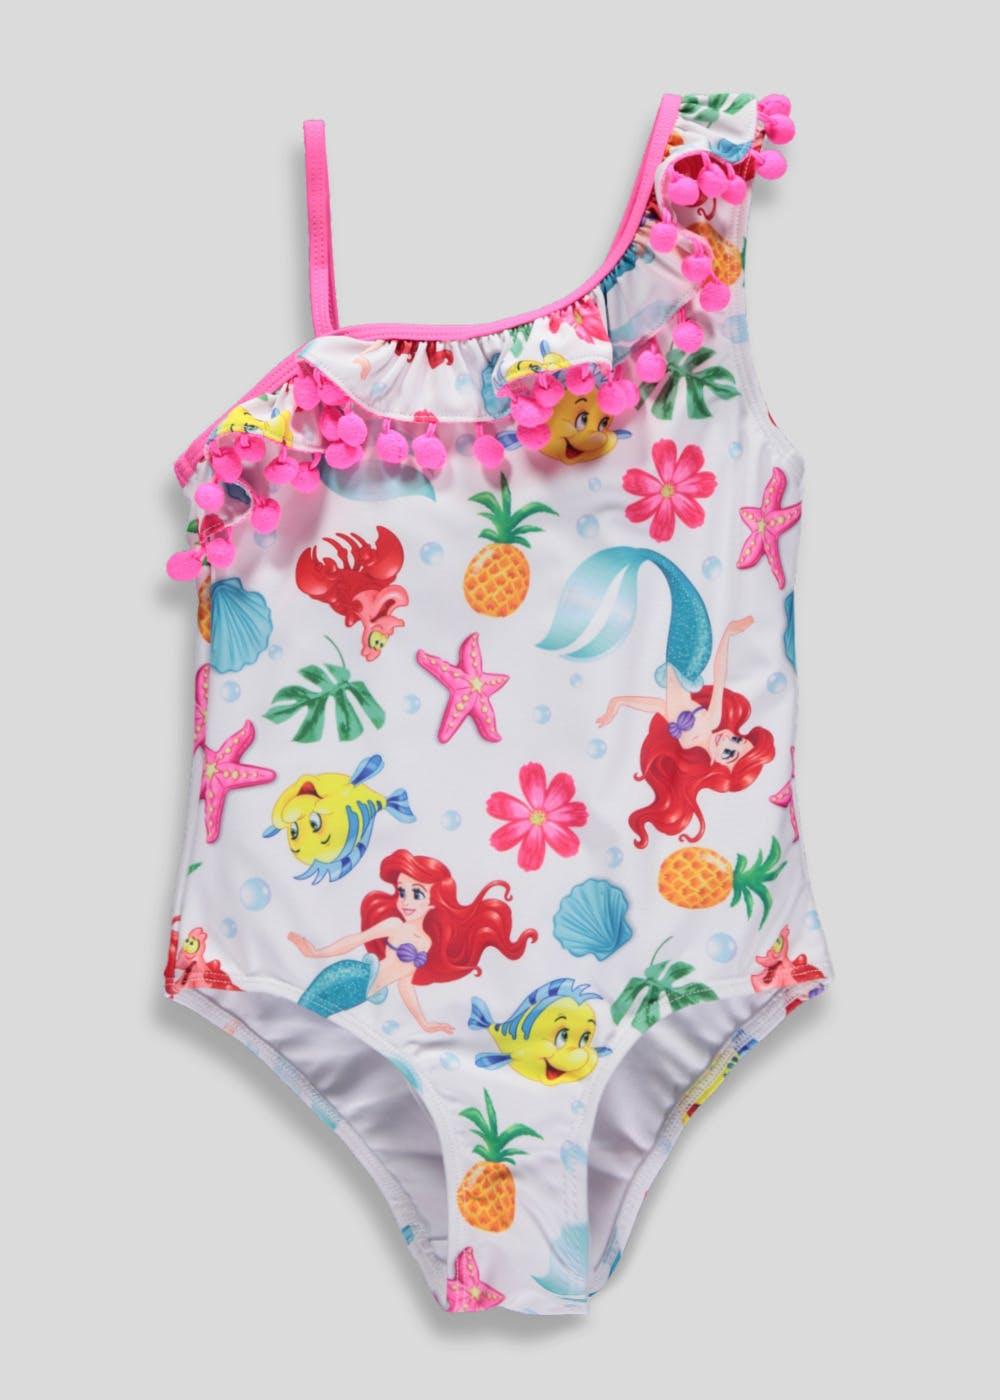 The little mermaid swimming costume £5 @ Matalan - Free c&c